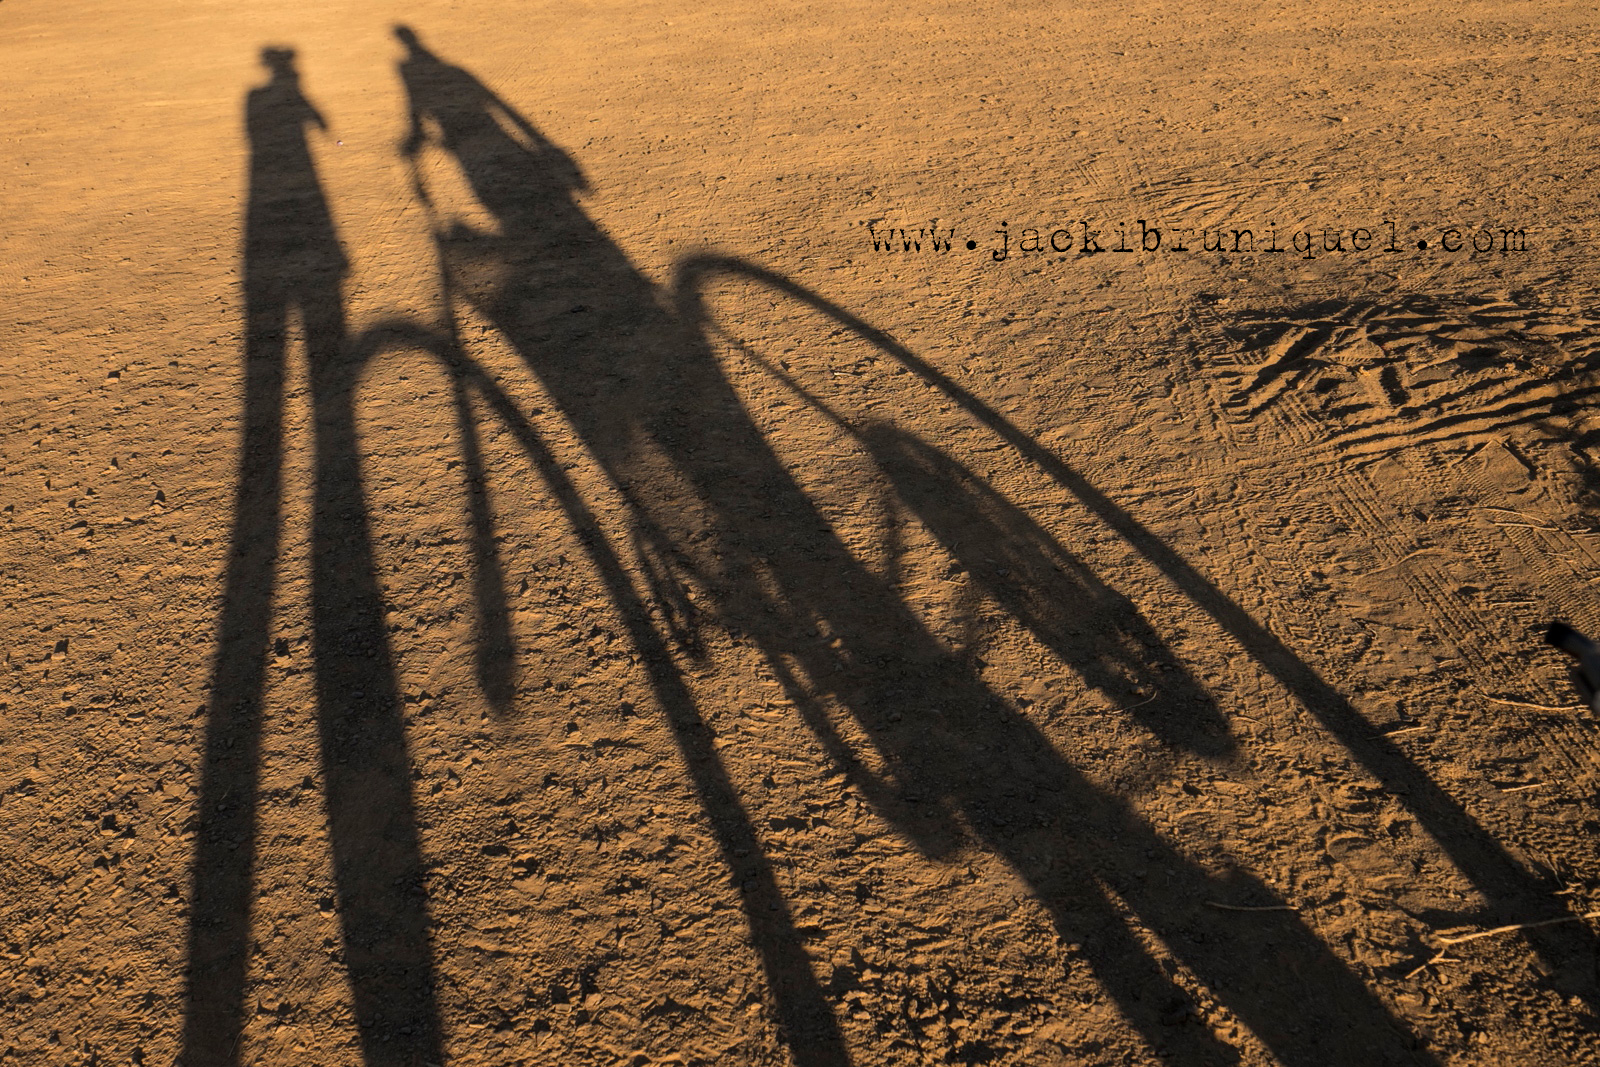 Afrika-Burn-2016-Creative-South-African-Photographer-Jacki-Bruniquel-029.jpg